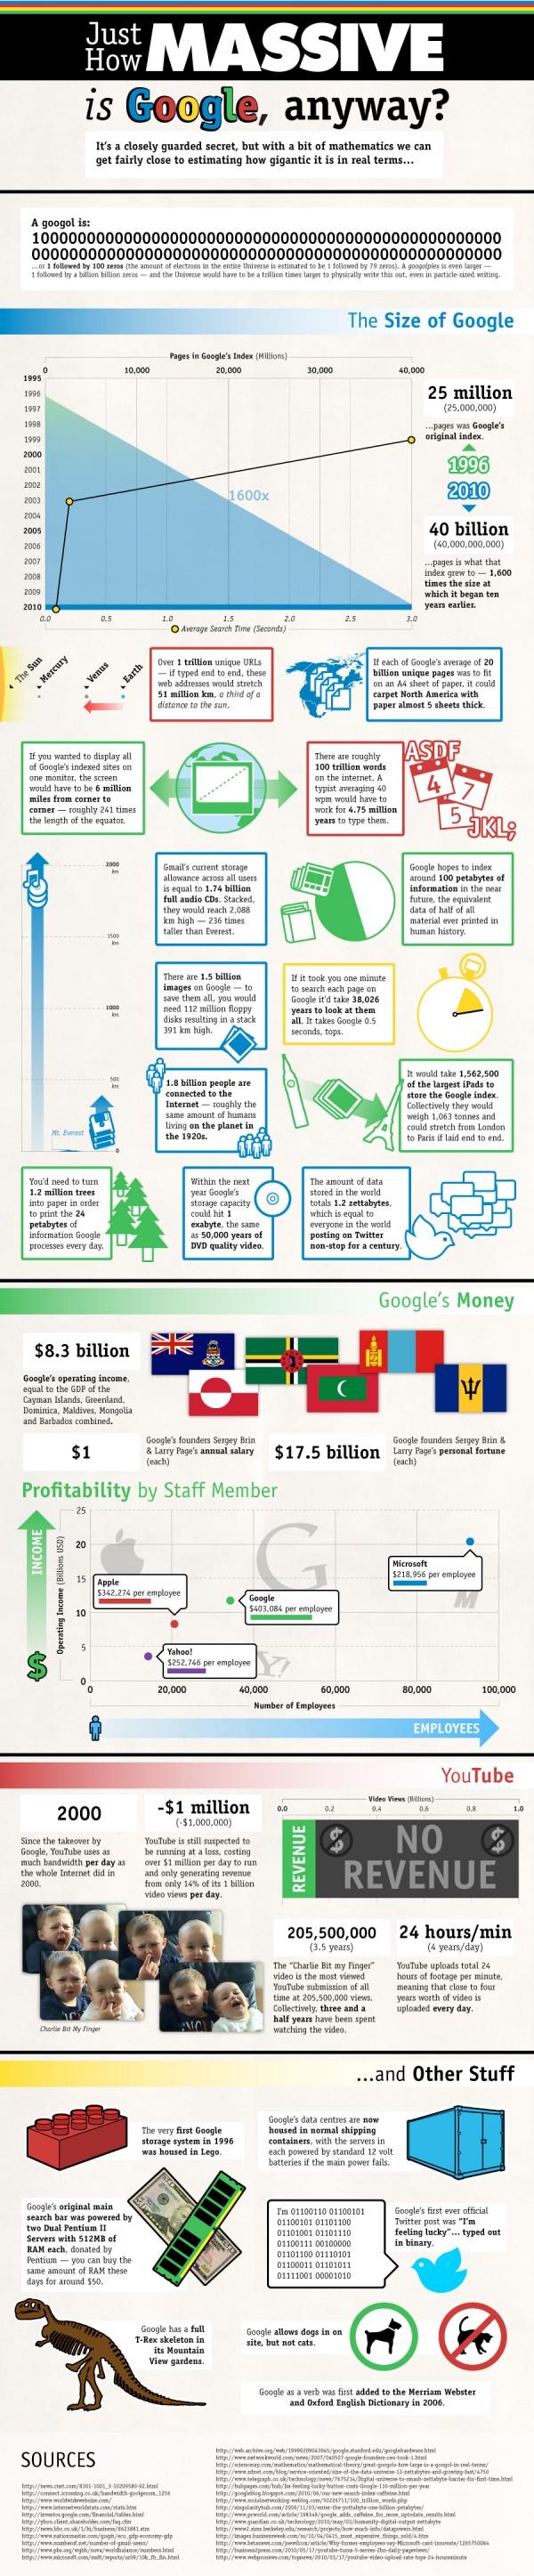 infographic-on-social-media-30